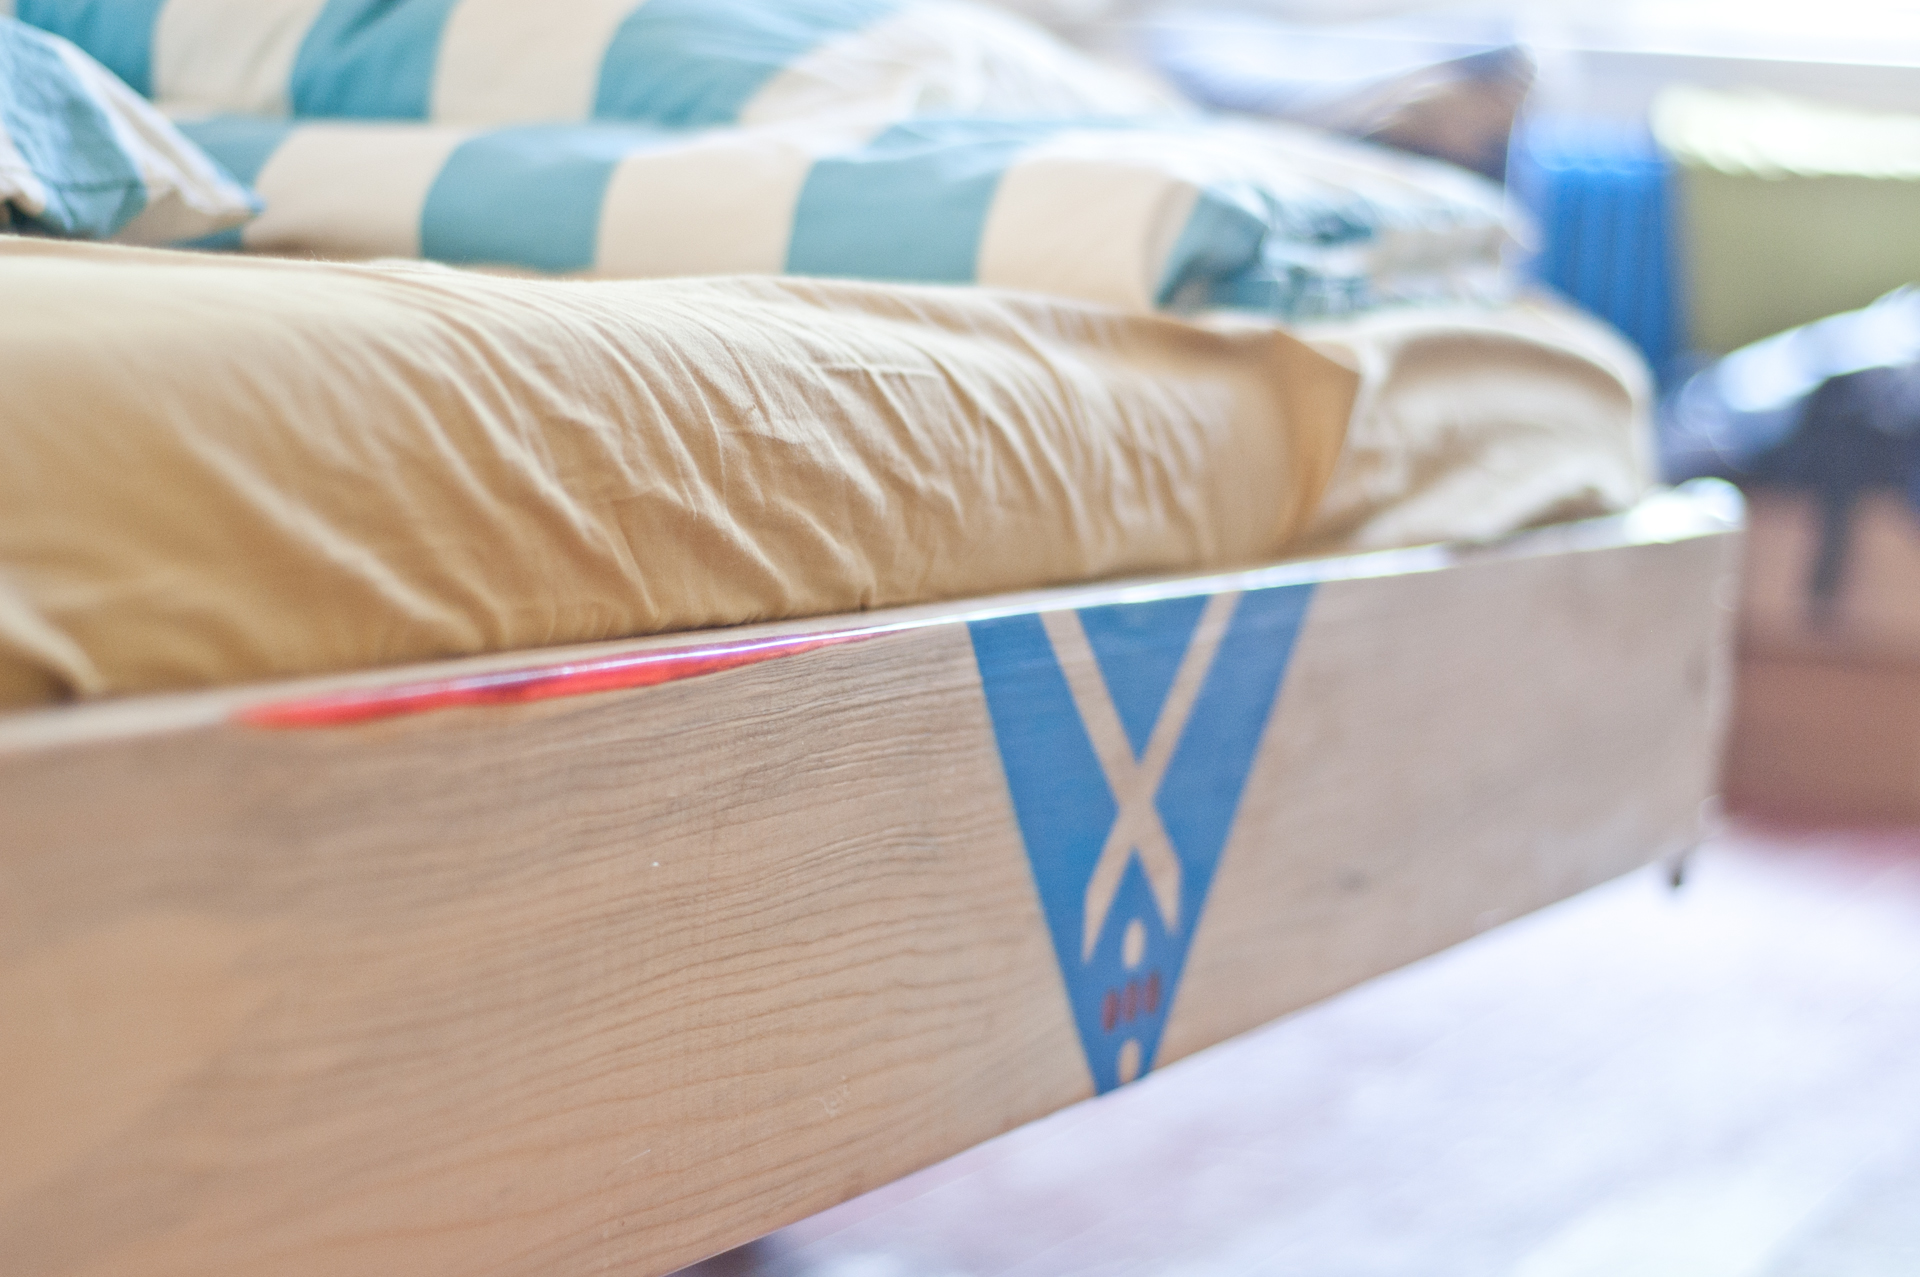 tototu by tototu -  sklapacia postel no.2 - cerveny epoxid